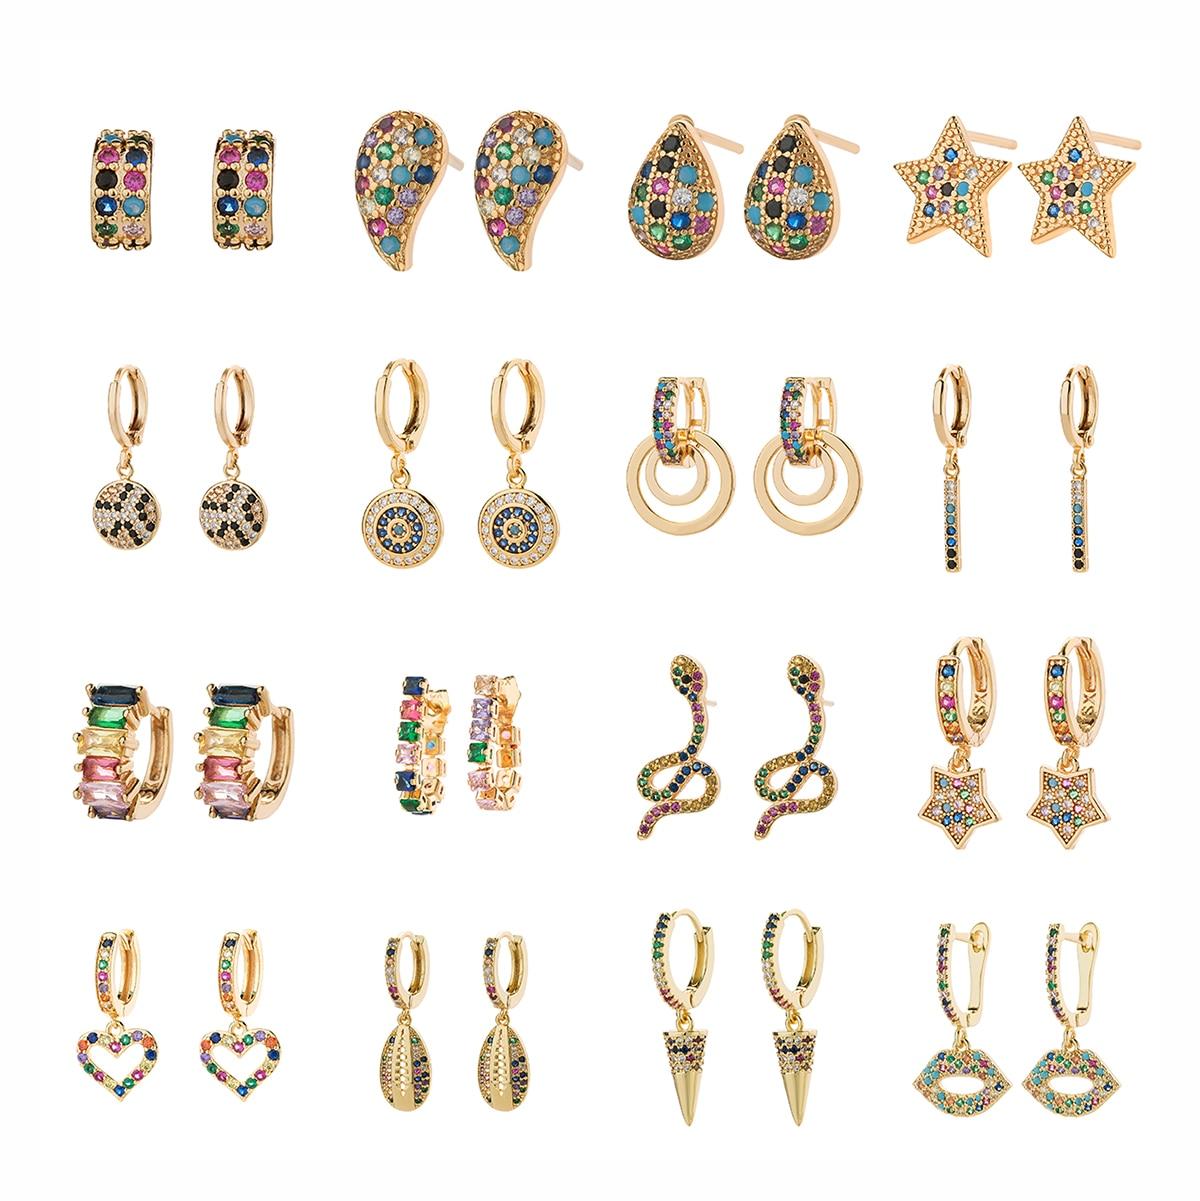 Fashion Women Micro Paved CZ Stud Earring Classic Circle Rainbow Copper Earrings Star Geometric Design Crystal Tassels Jewelry